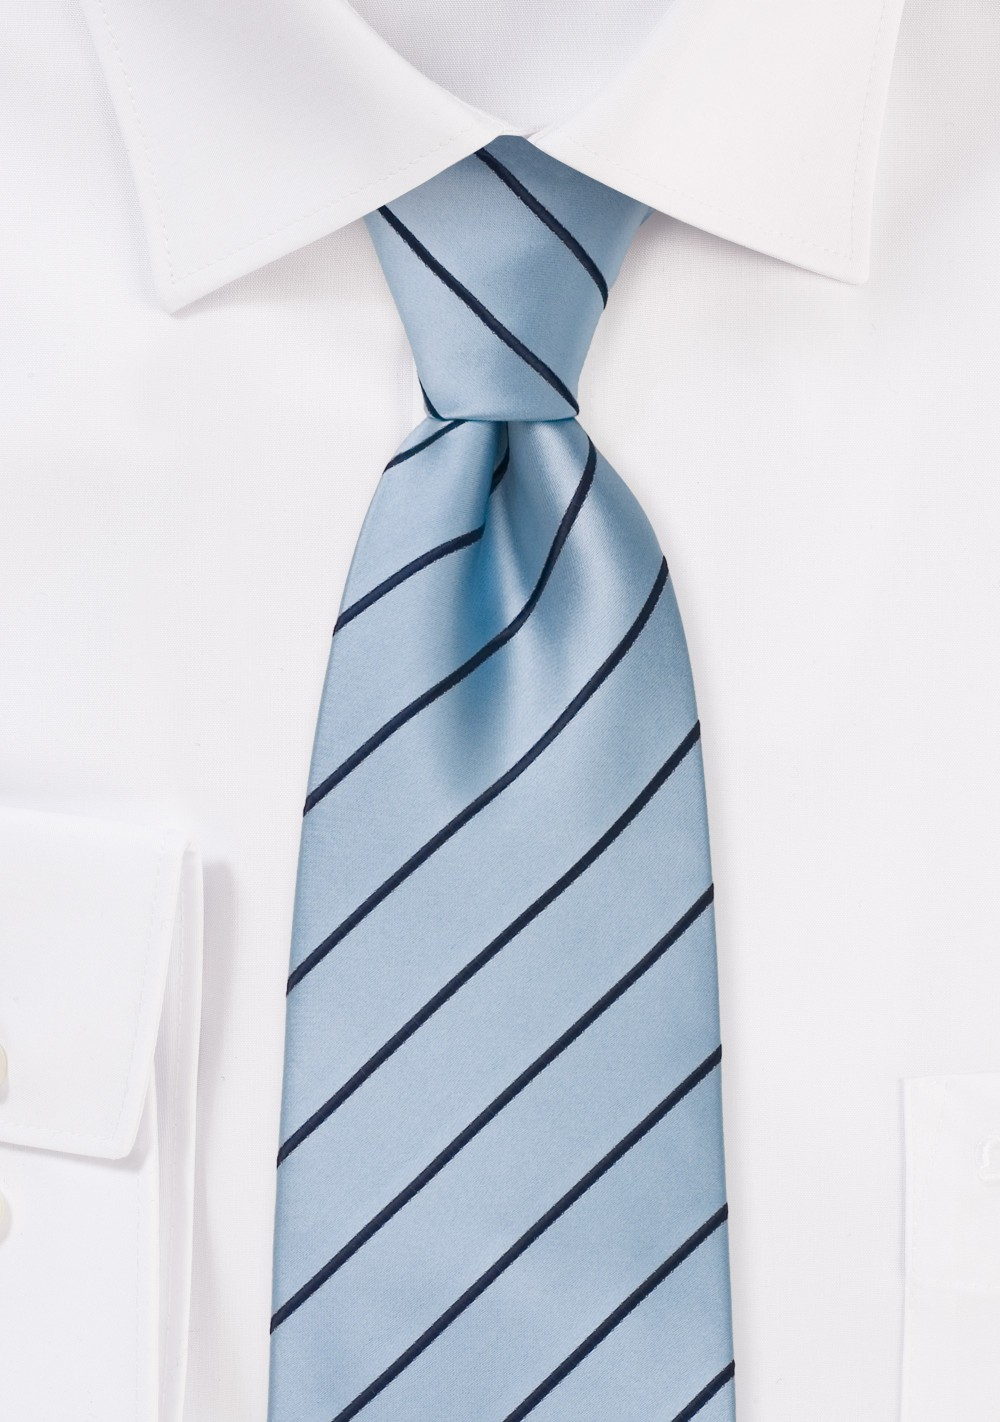 Light Blue Kids Necktie with Navy Stripes